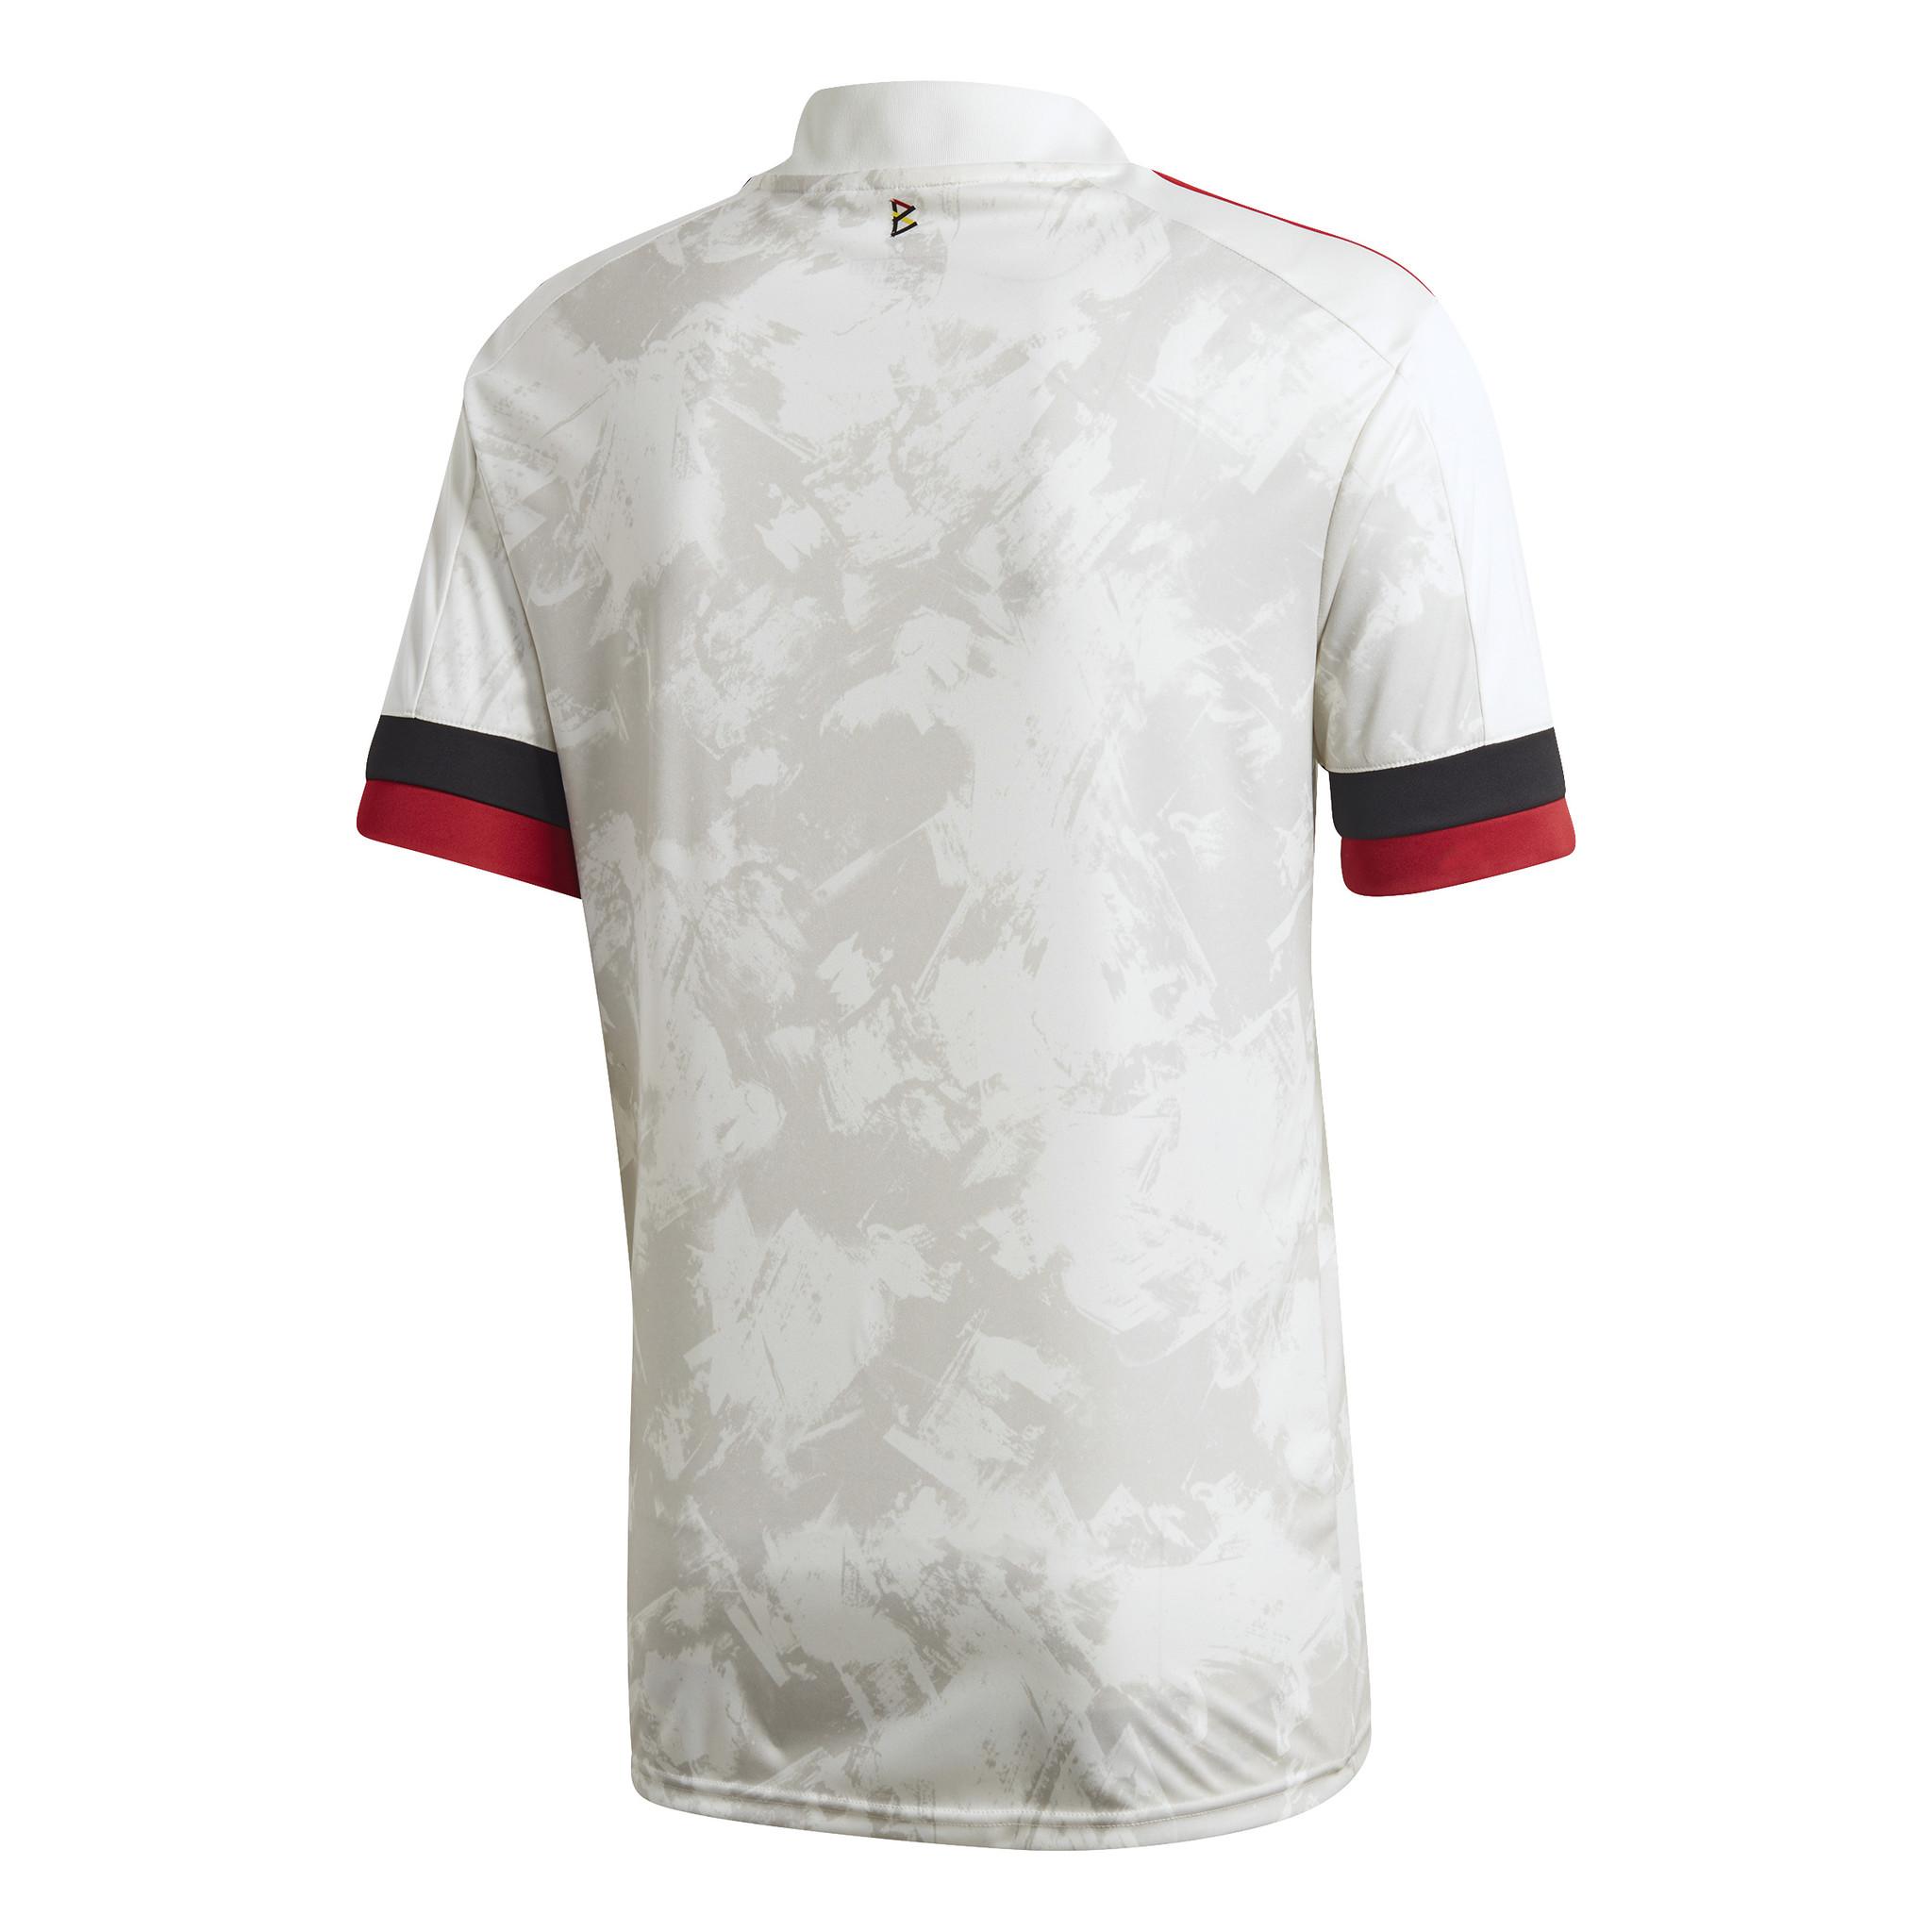 Adidas ADIDAS JR RBFA Away Jersey EK2021